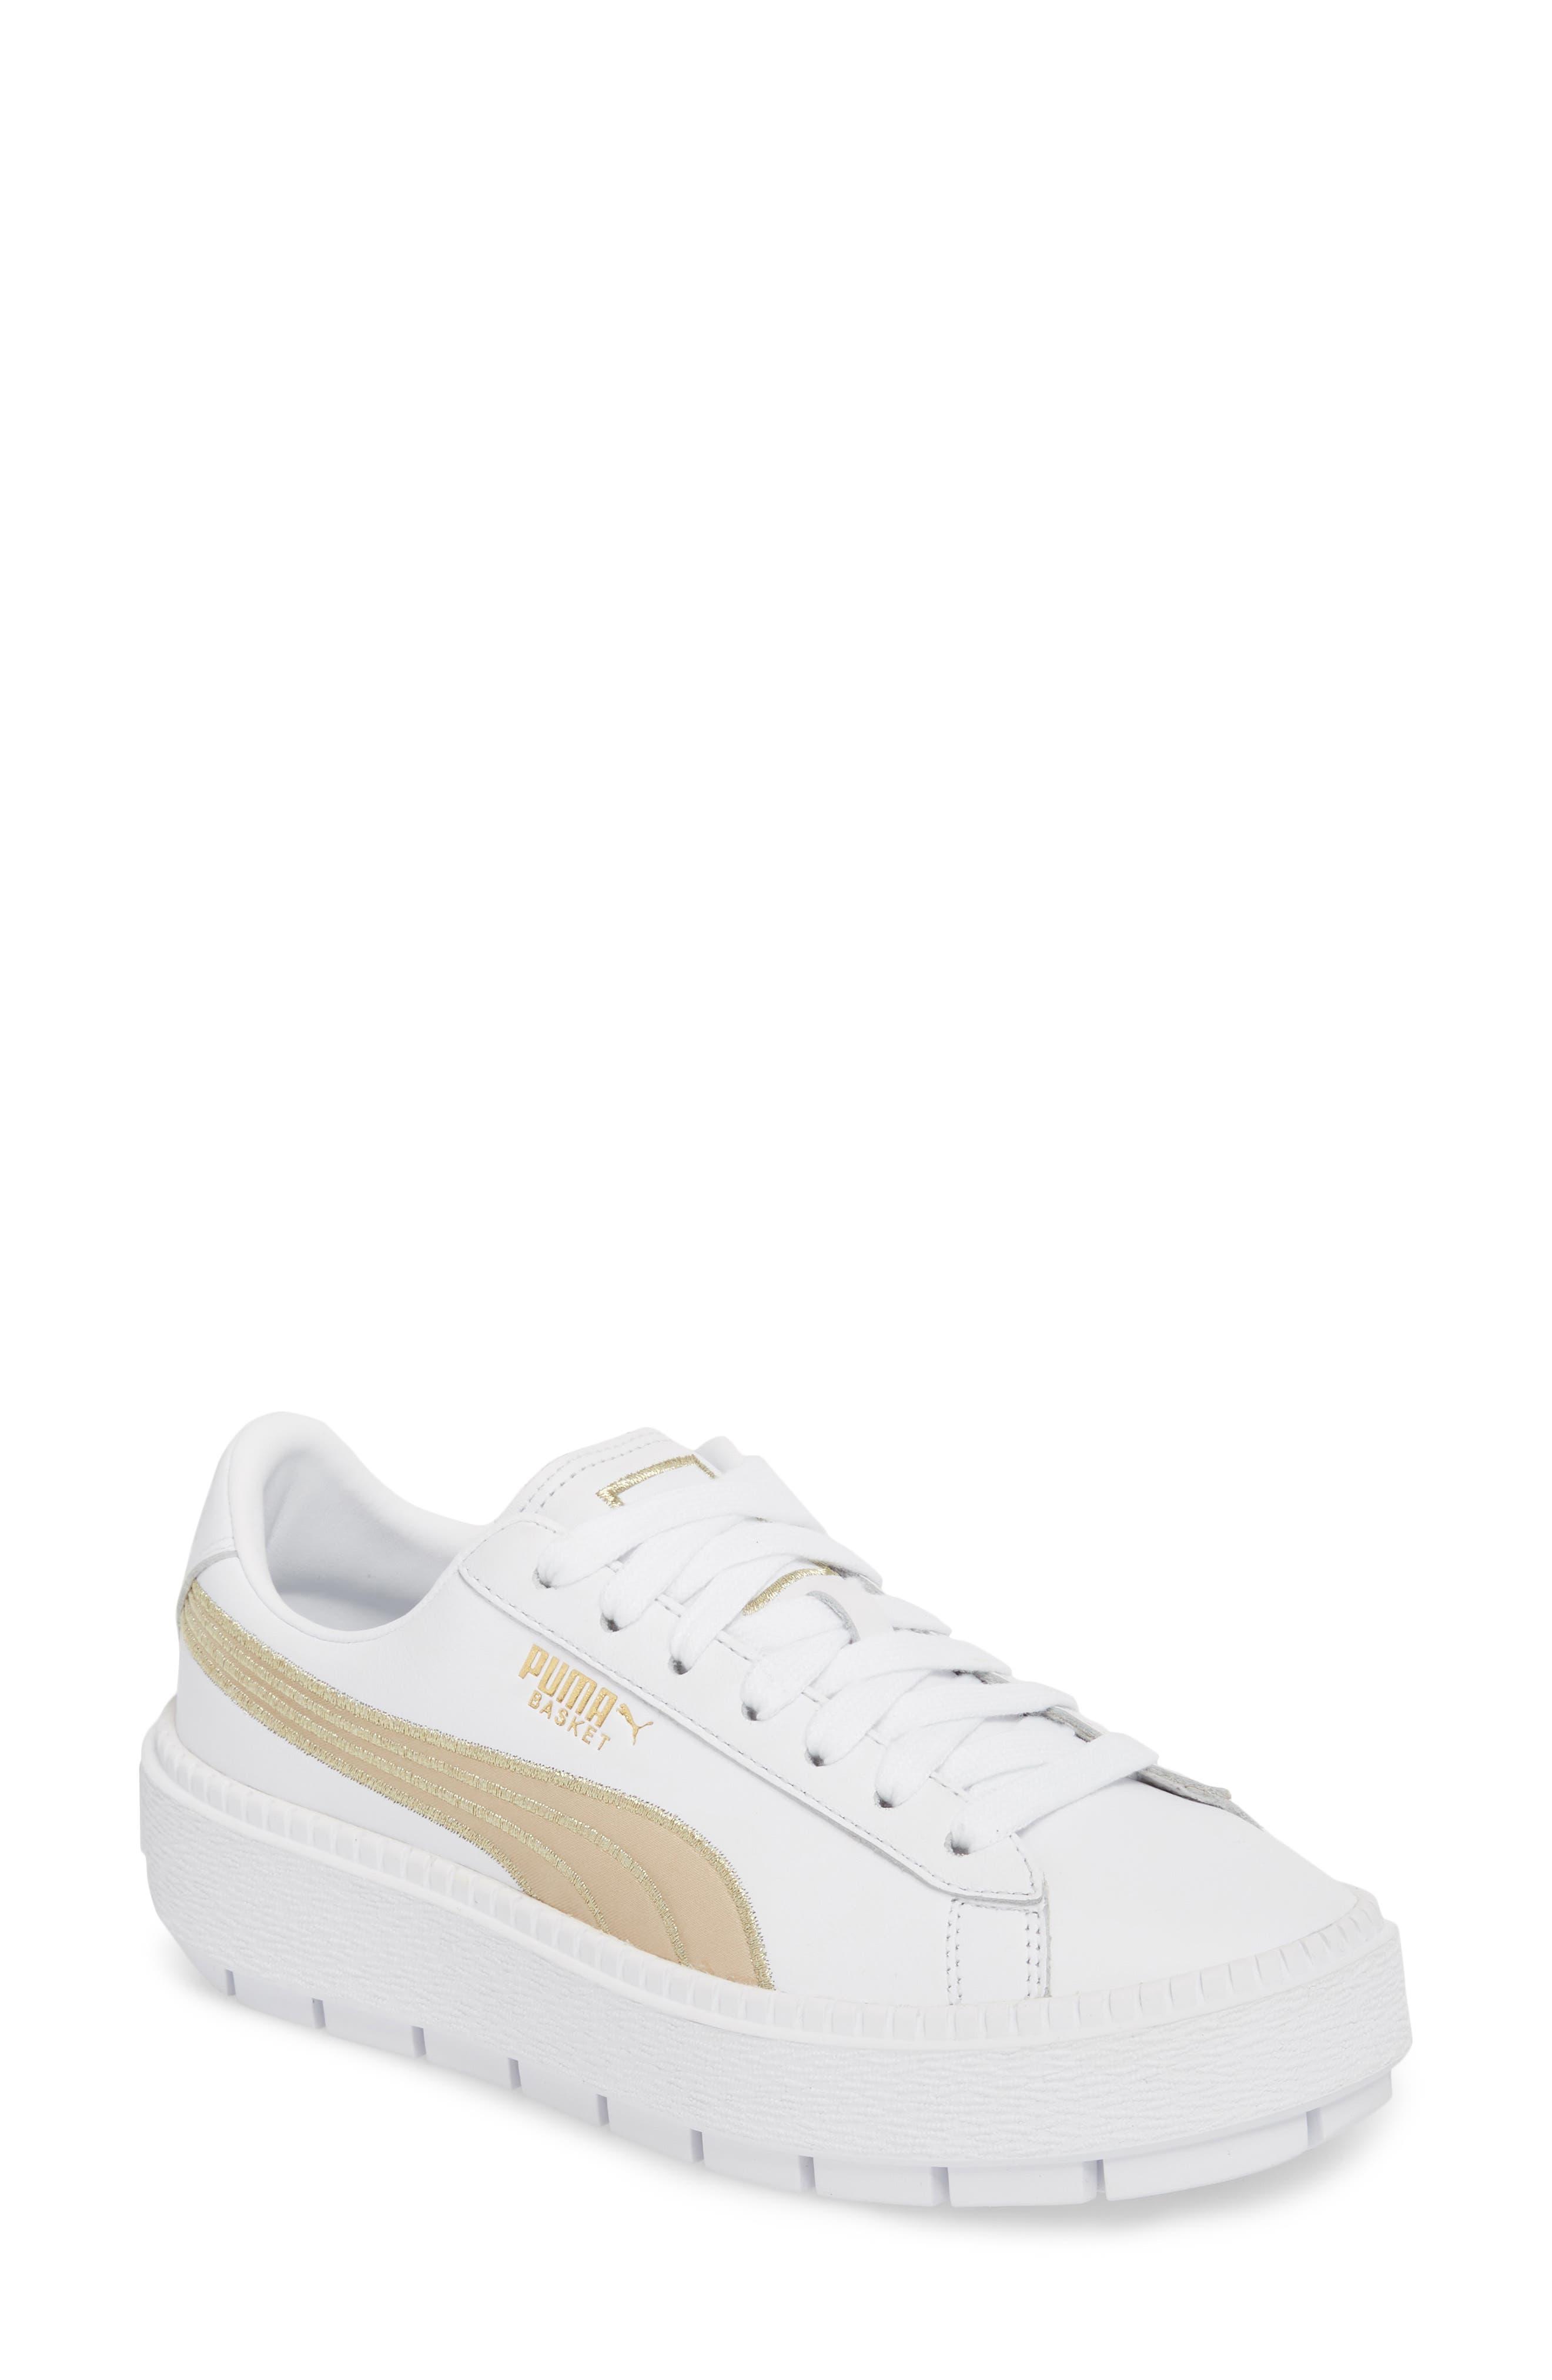 Platform Trace Sneaker,                         Main,                         color, Puma White/ Metallic Gold